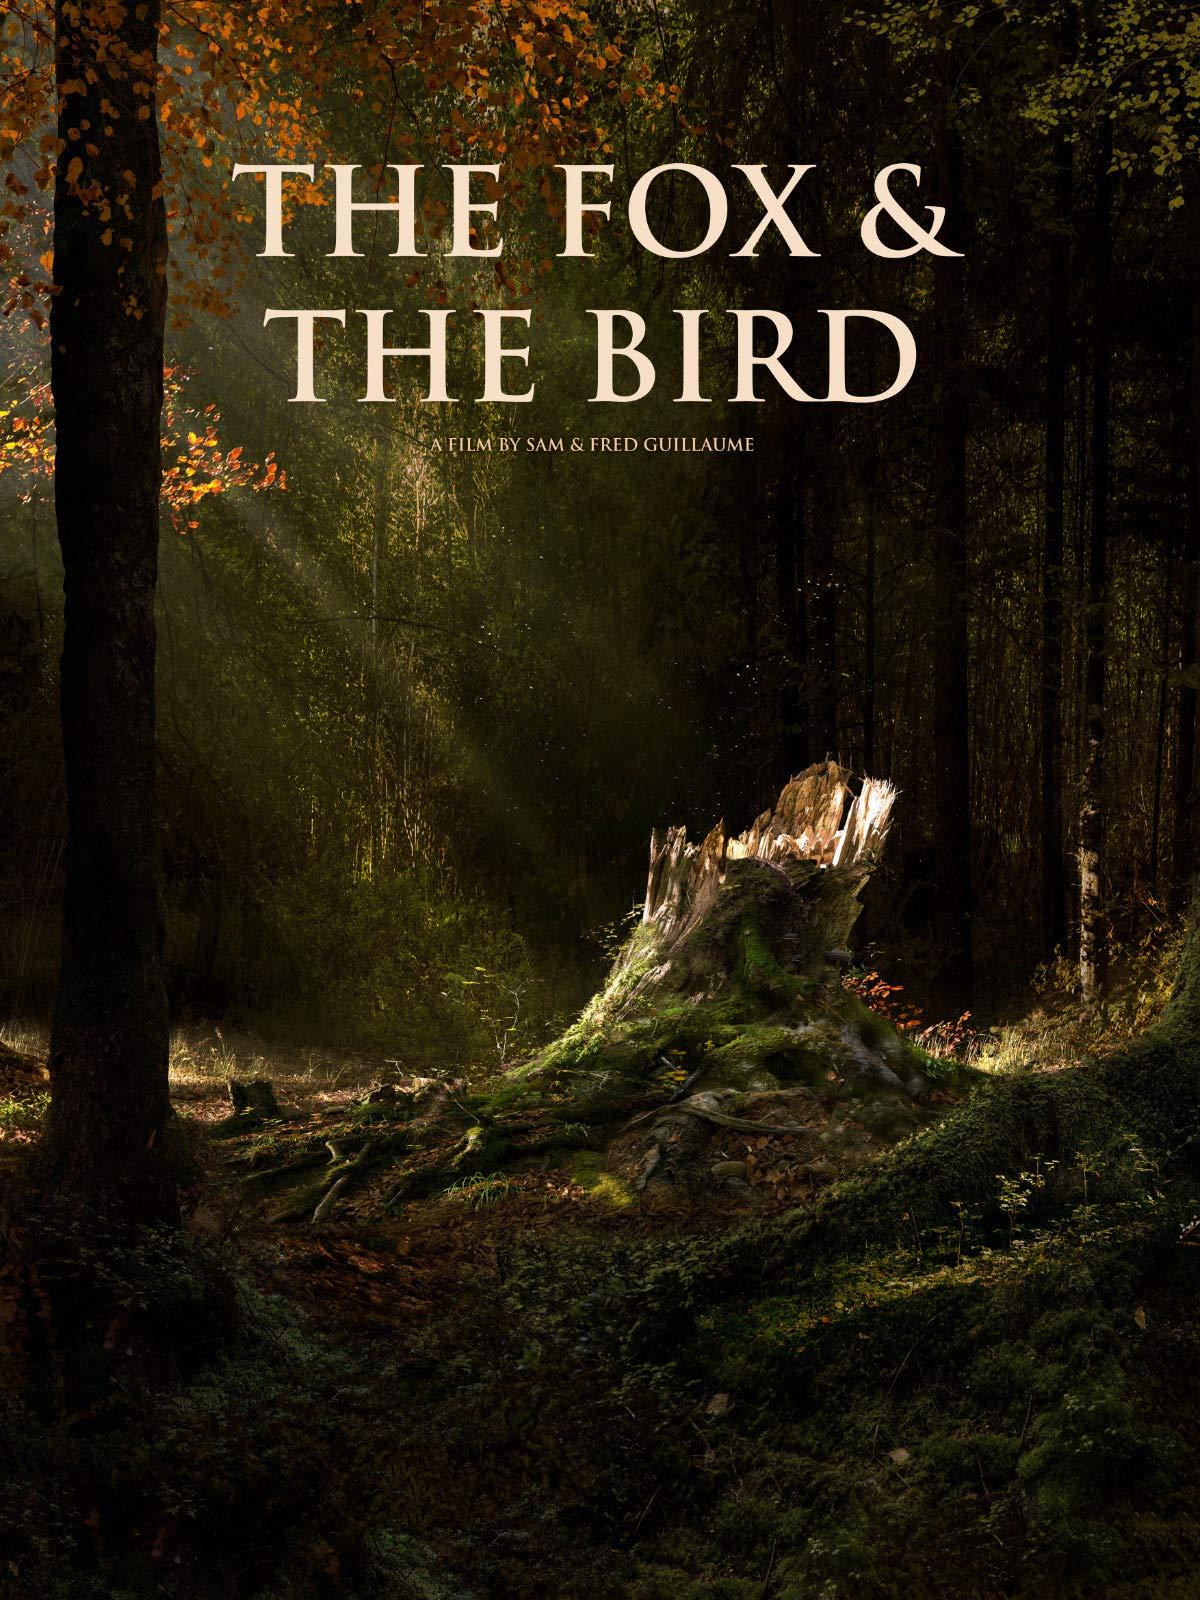 the fox and the bird curta metragem em cgi digido fred e sam guillaume - The Fox and the Bird | Curta metragem em CGI de Fred e Sam Guillaume